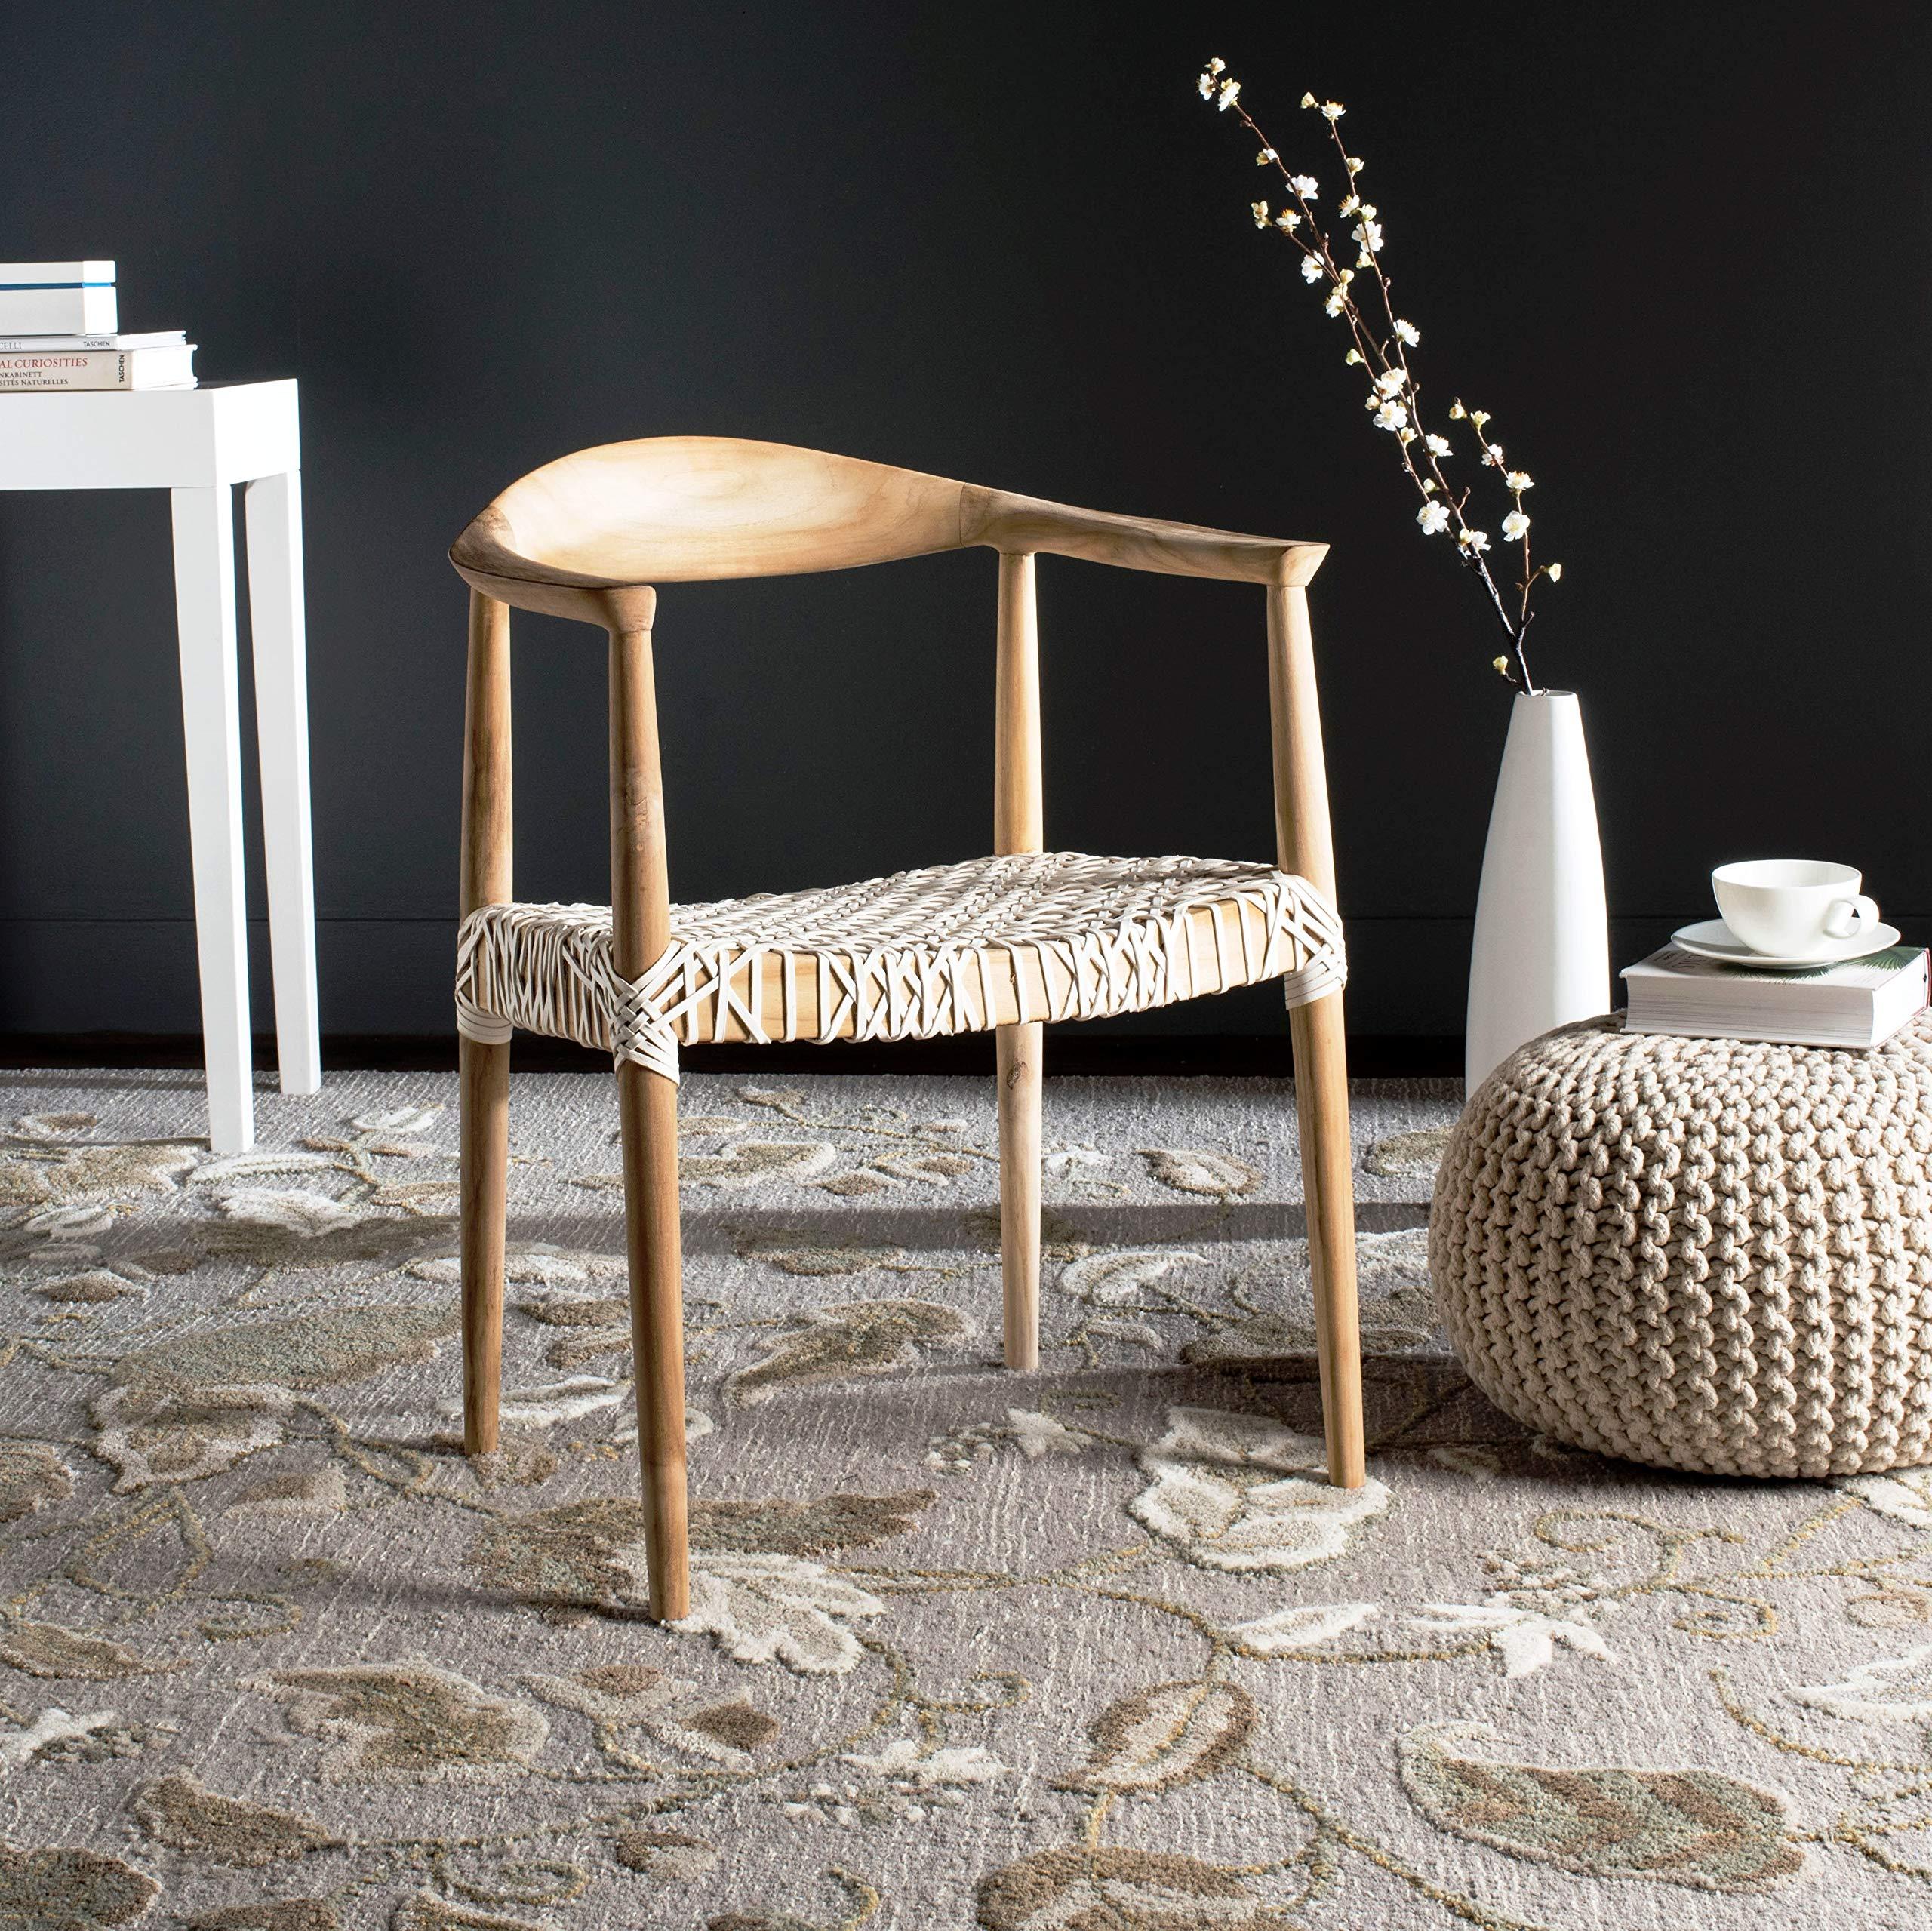 Safavieh Home Collection Wade Light Oak Teak Wood Arm Chair by Safavieh